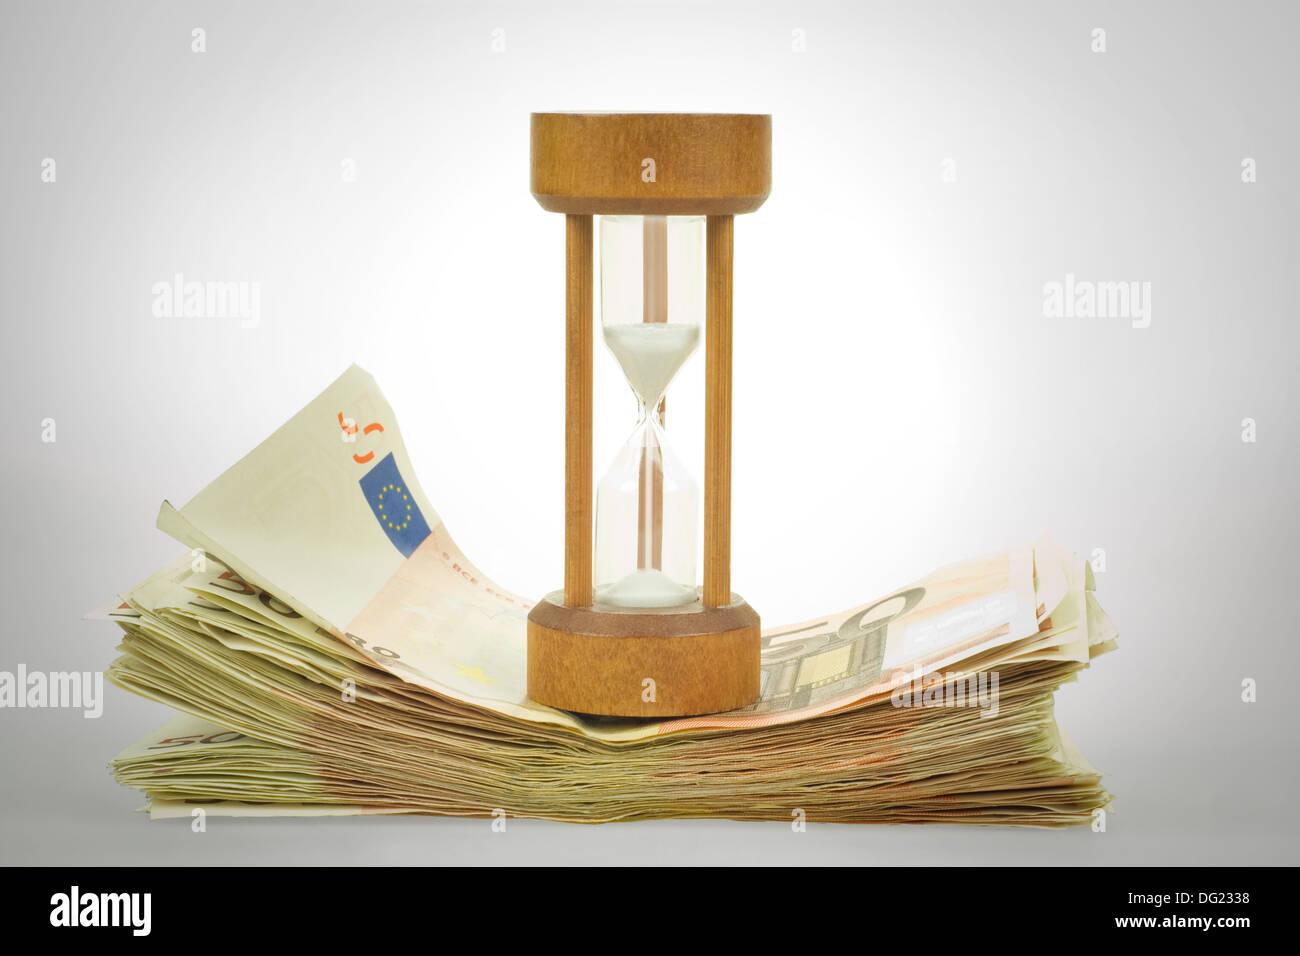 sandglass on wad of fifty euros bills - Stock Image